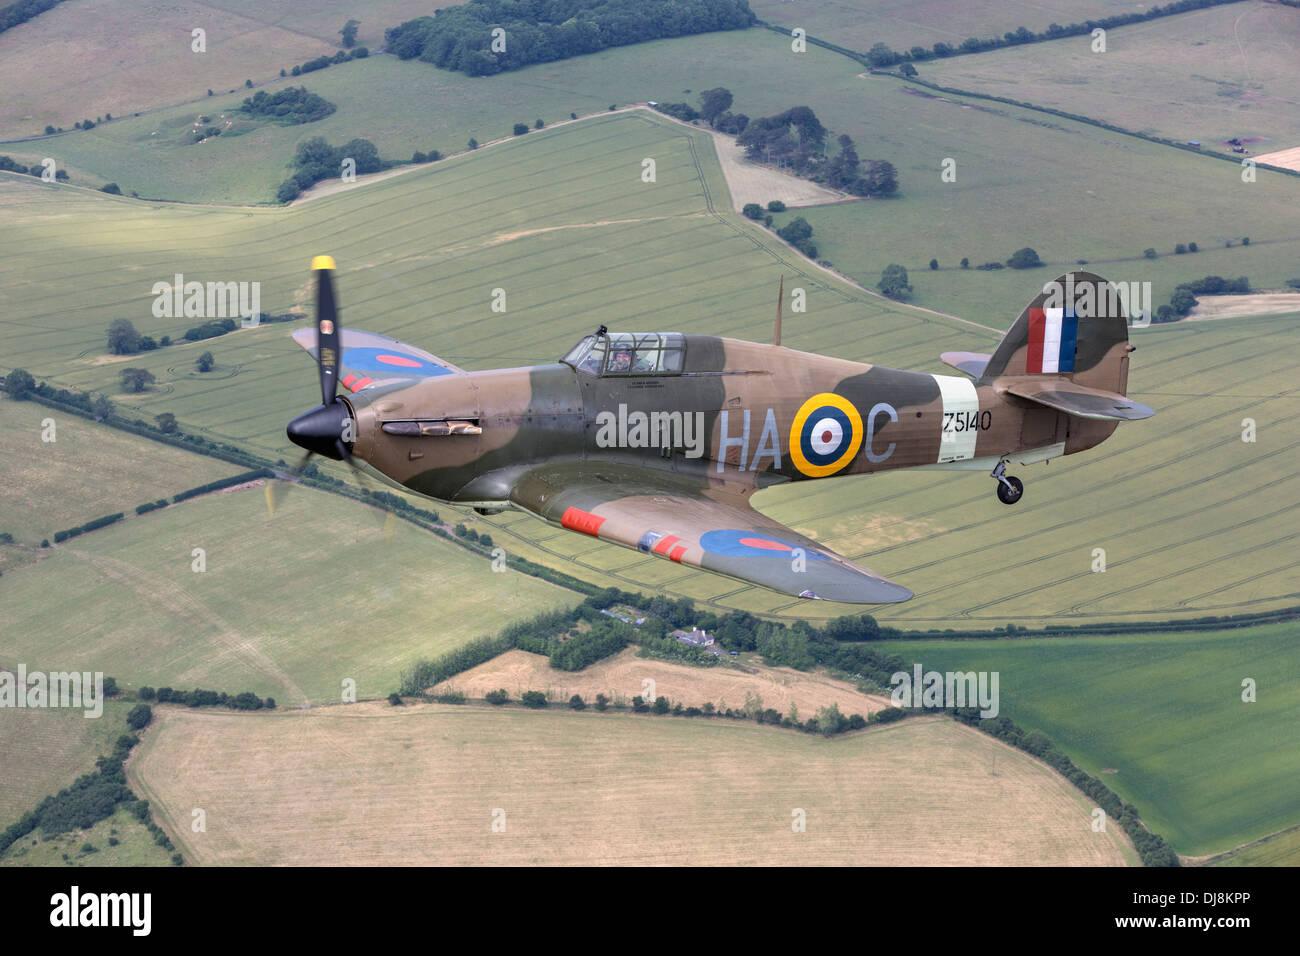 A classic World War 2 Hawker Hurricane fighter - Stock Image